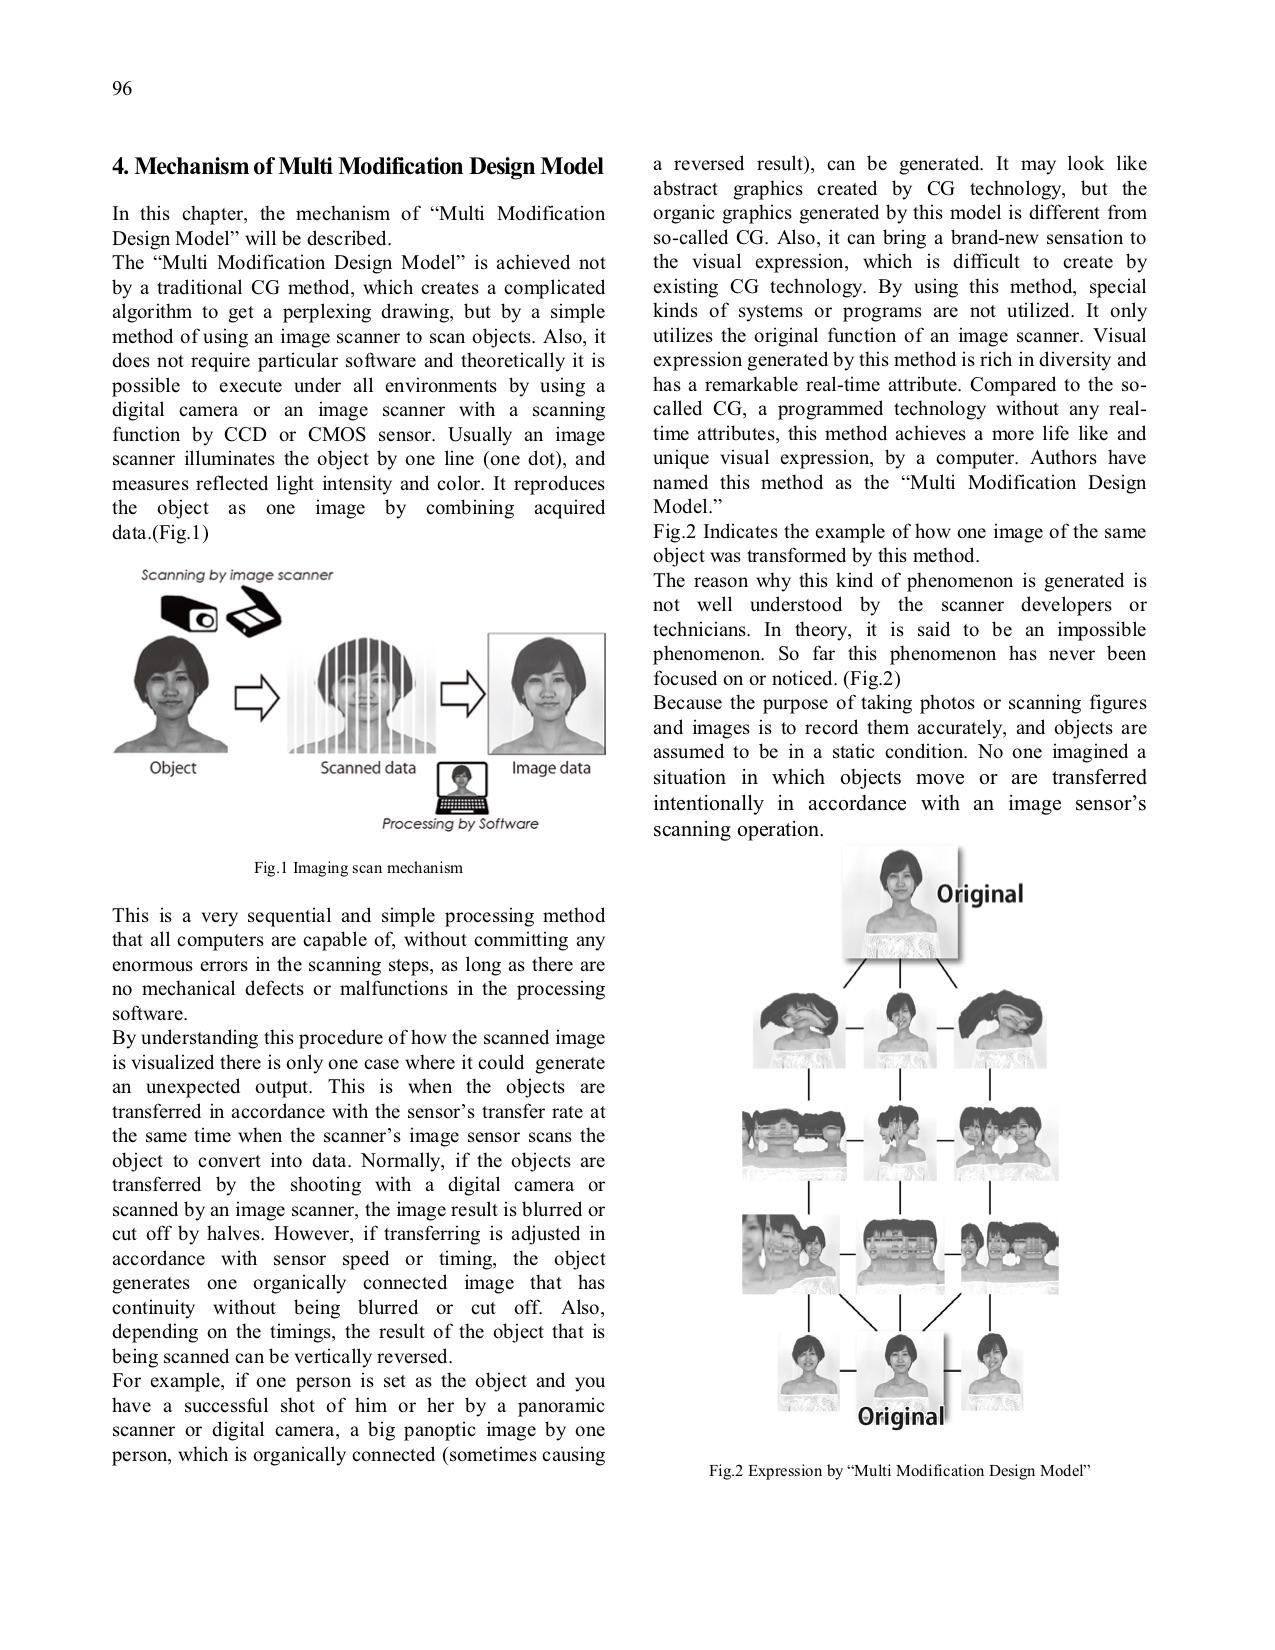 Academic Paper p3